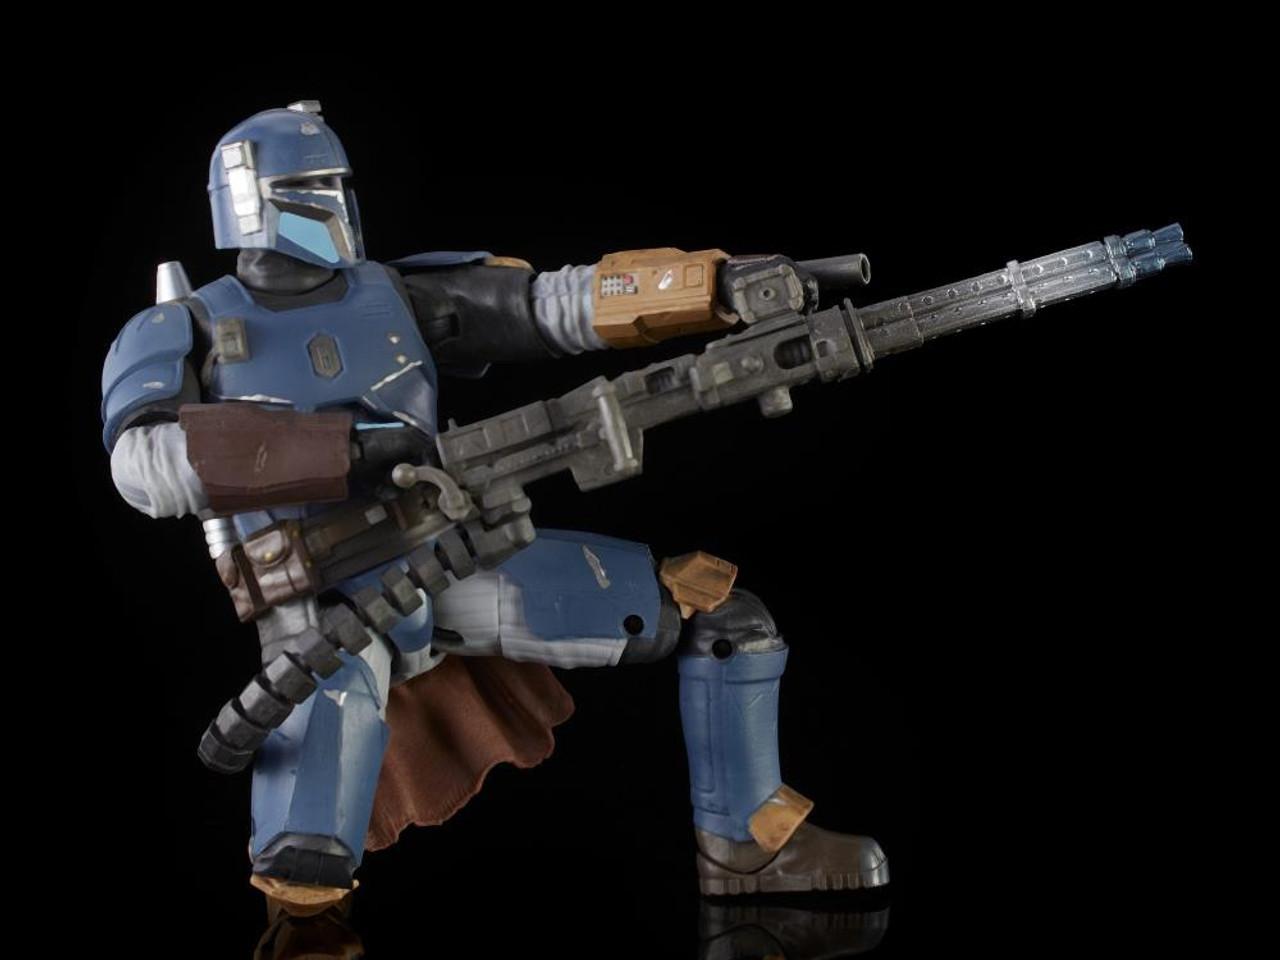 Star Wars ~ The Black Series ~ The Mandalorian ~ Heavy Infantry Mandalorian  Action Figure